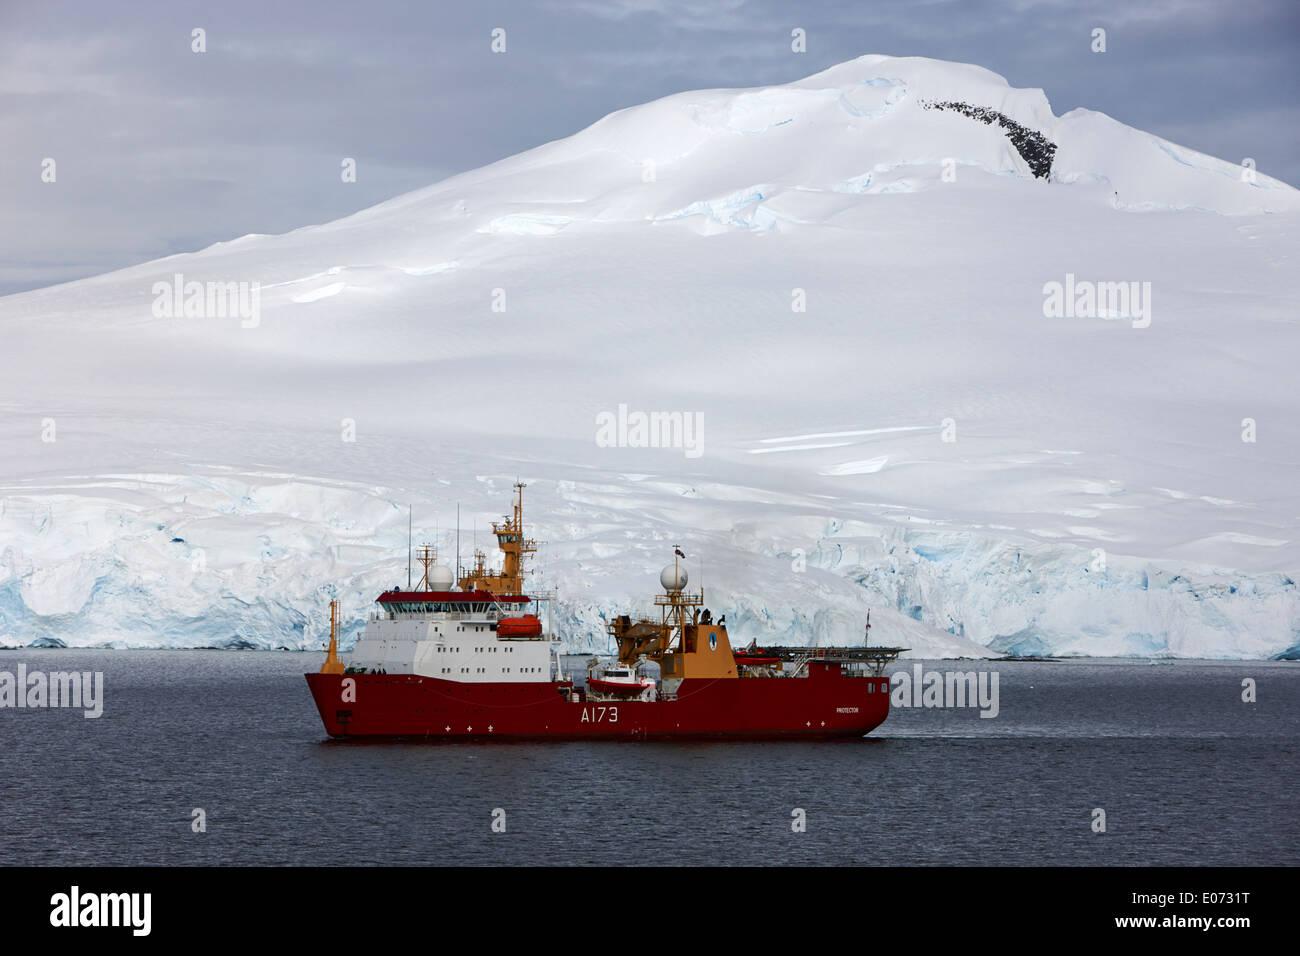 Royal Navy Ice Patrol Ship HMS Protector in Port Lockroy Antarctica - Stock Image